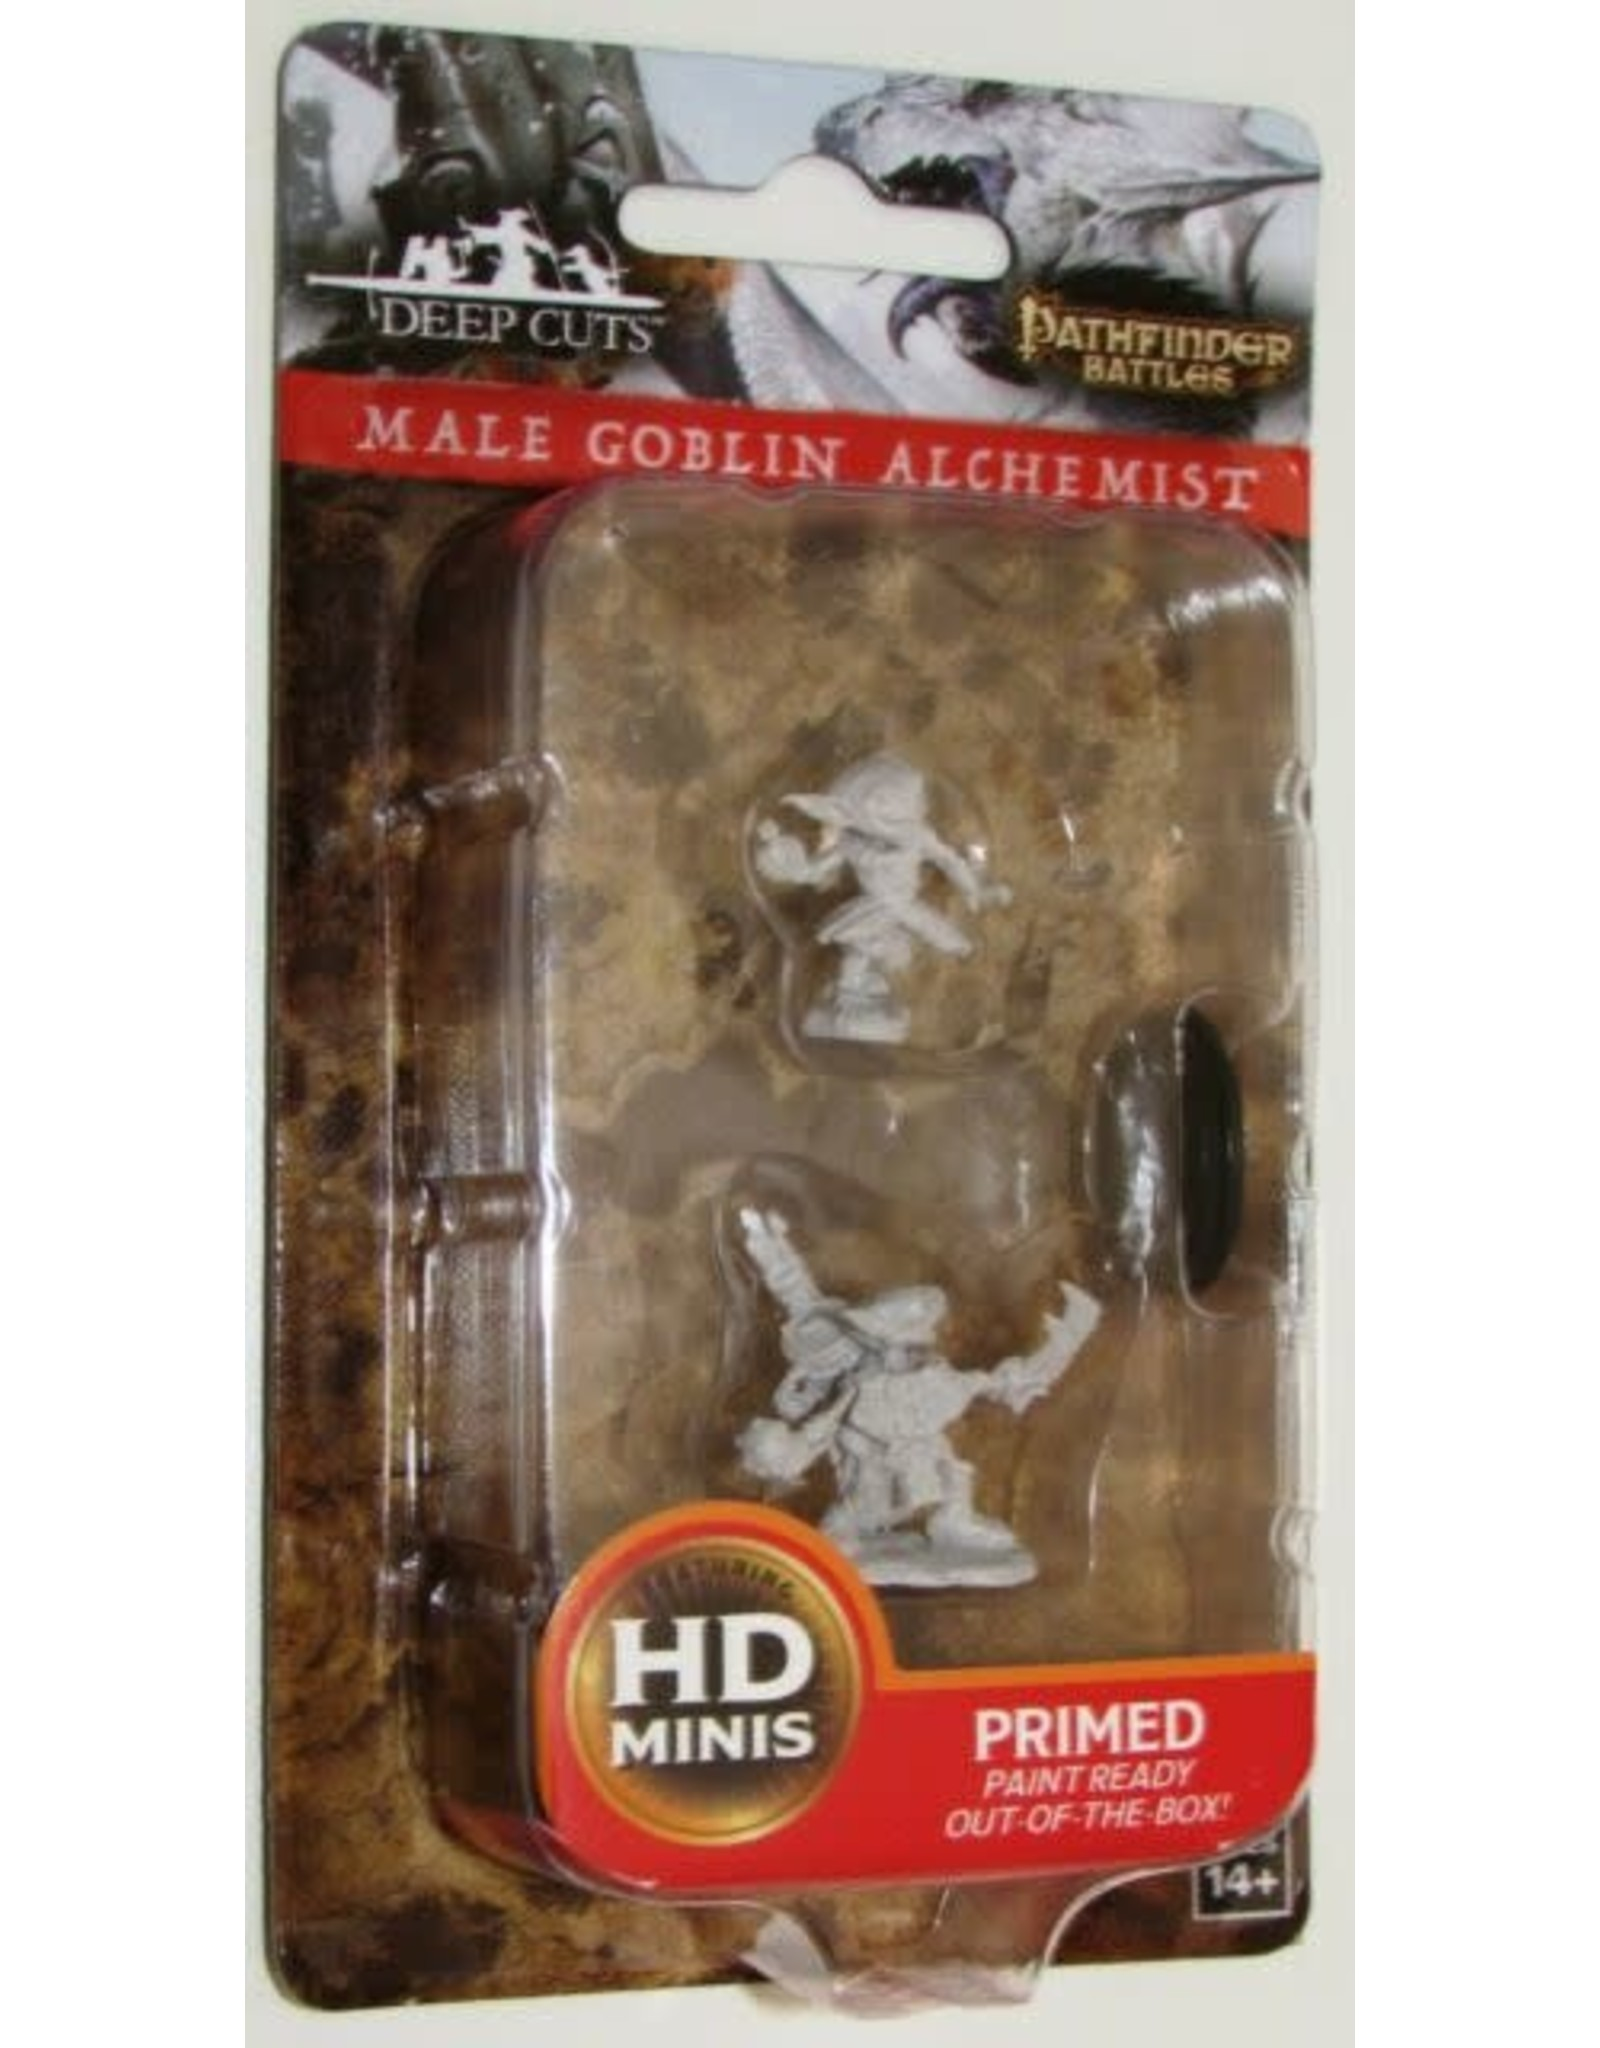 Wiz-Kids Pathfinder Deep Cuts - Male Goblin Alchemist